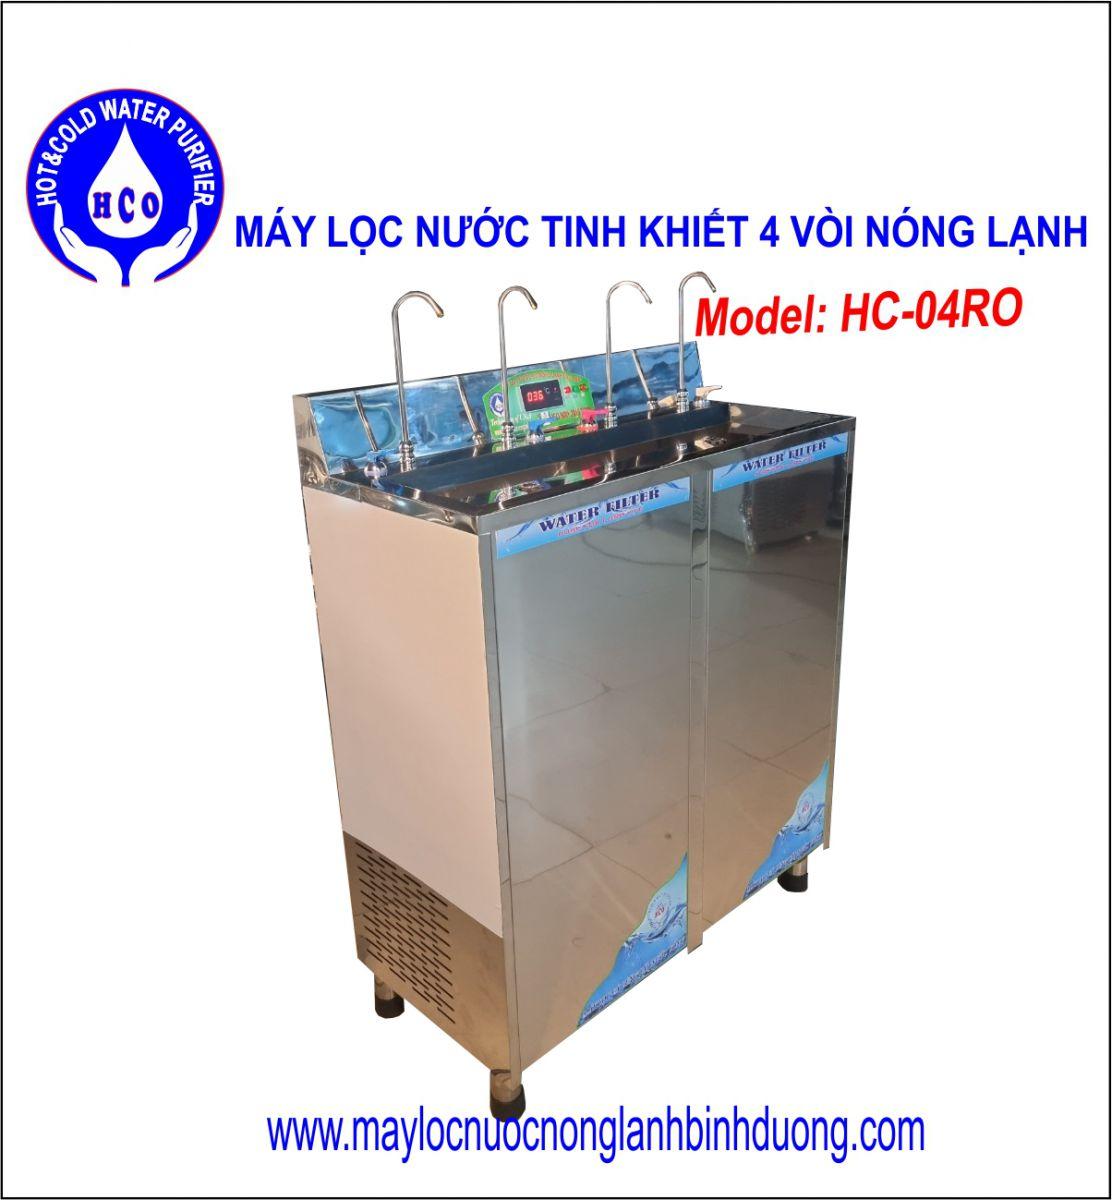 may-loc-nuoc-tinh-khiet-nong-lanh-4-voi-hco